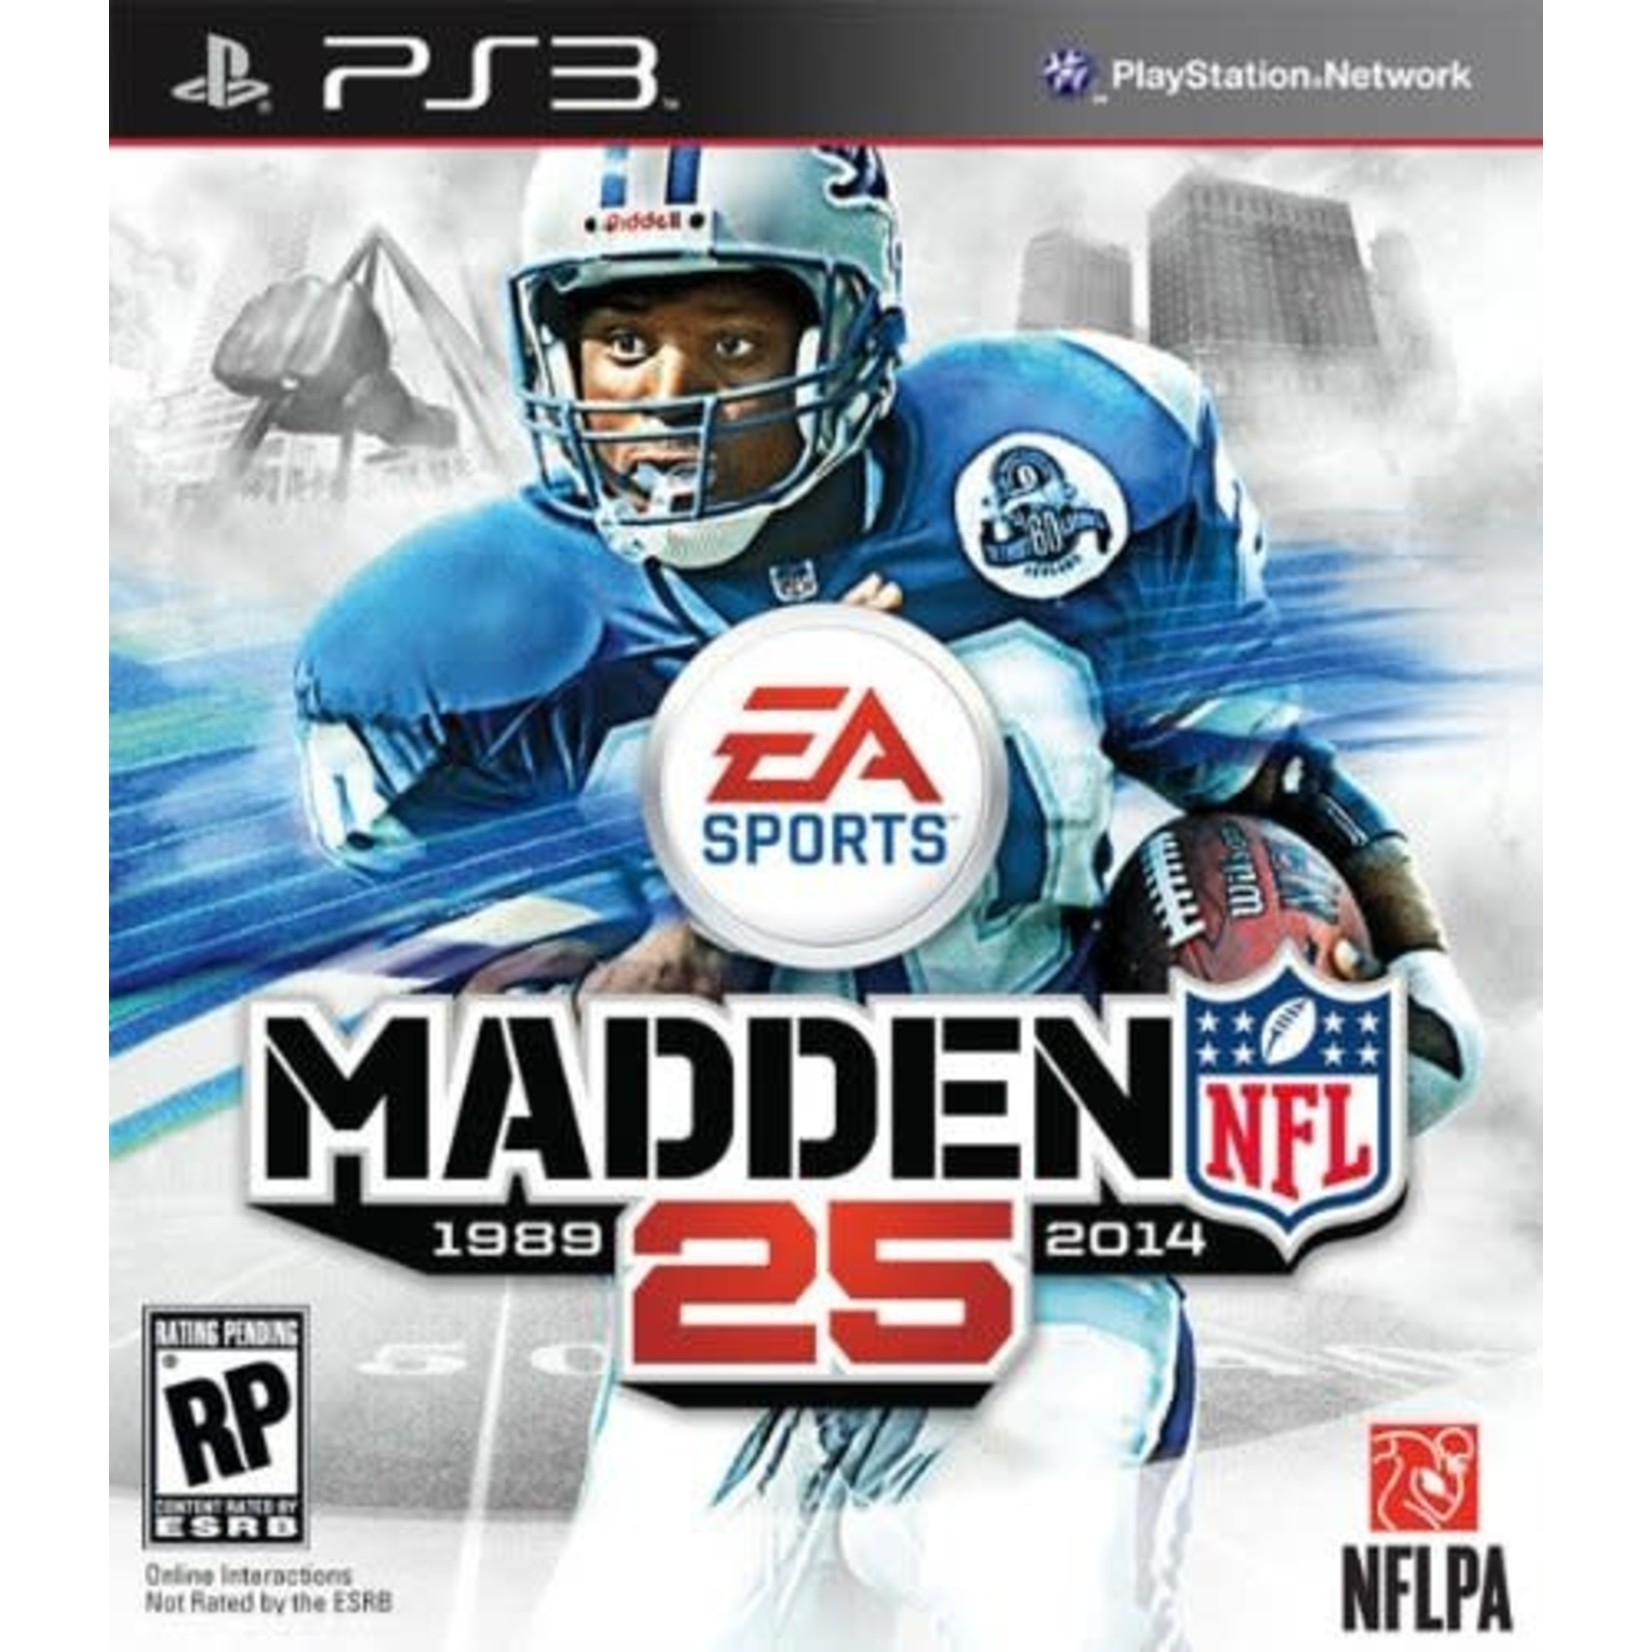 PS3U-Madden NFL 25